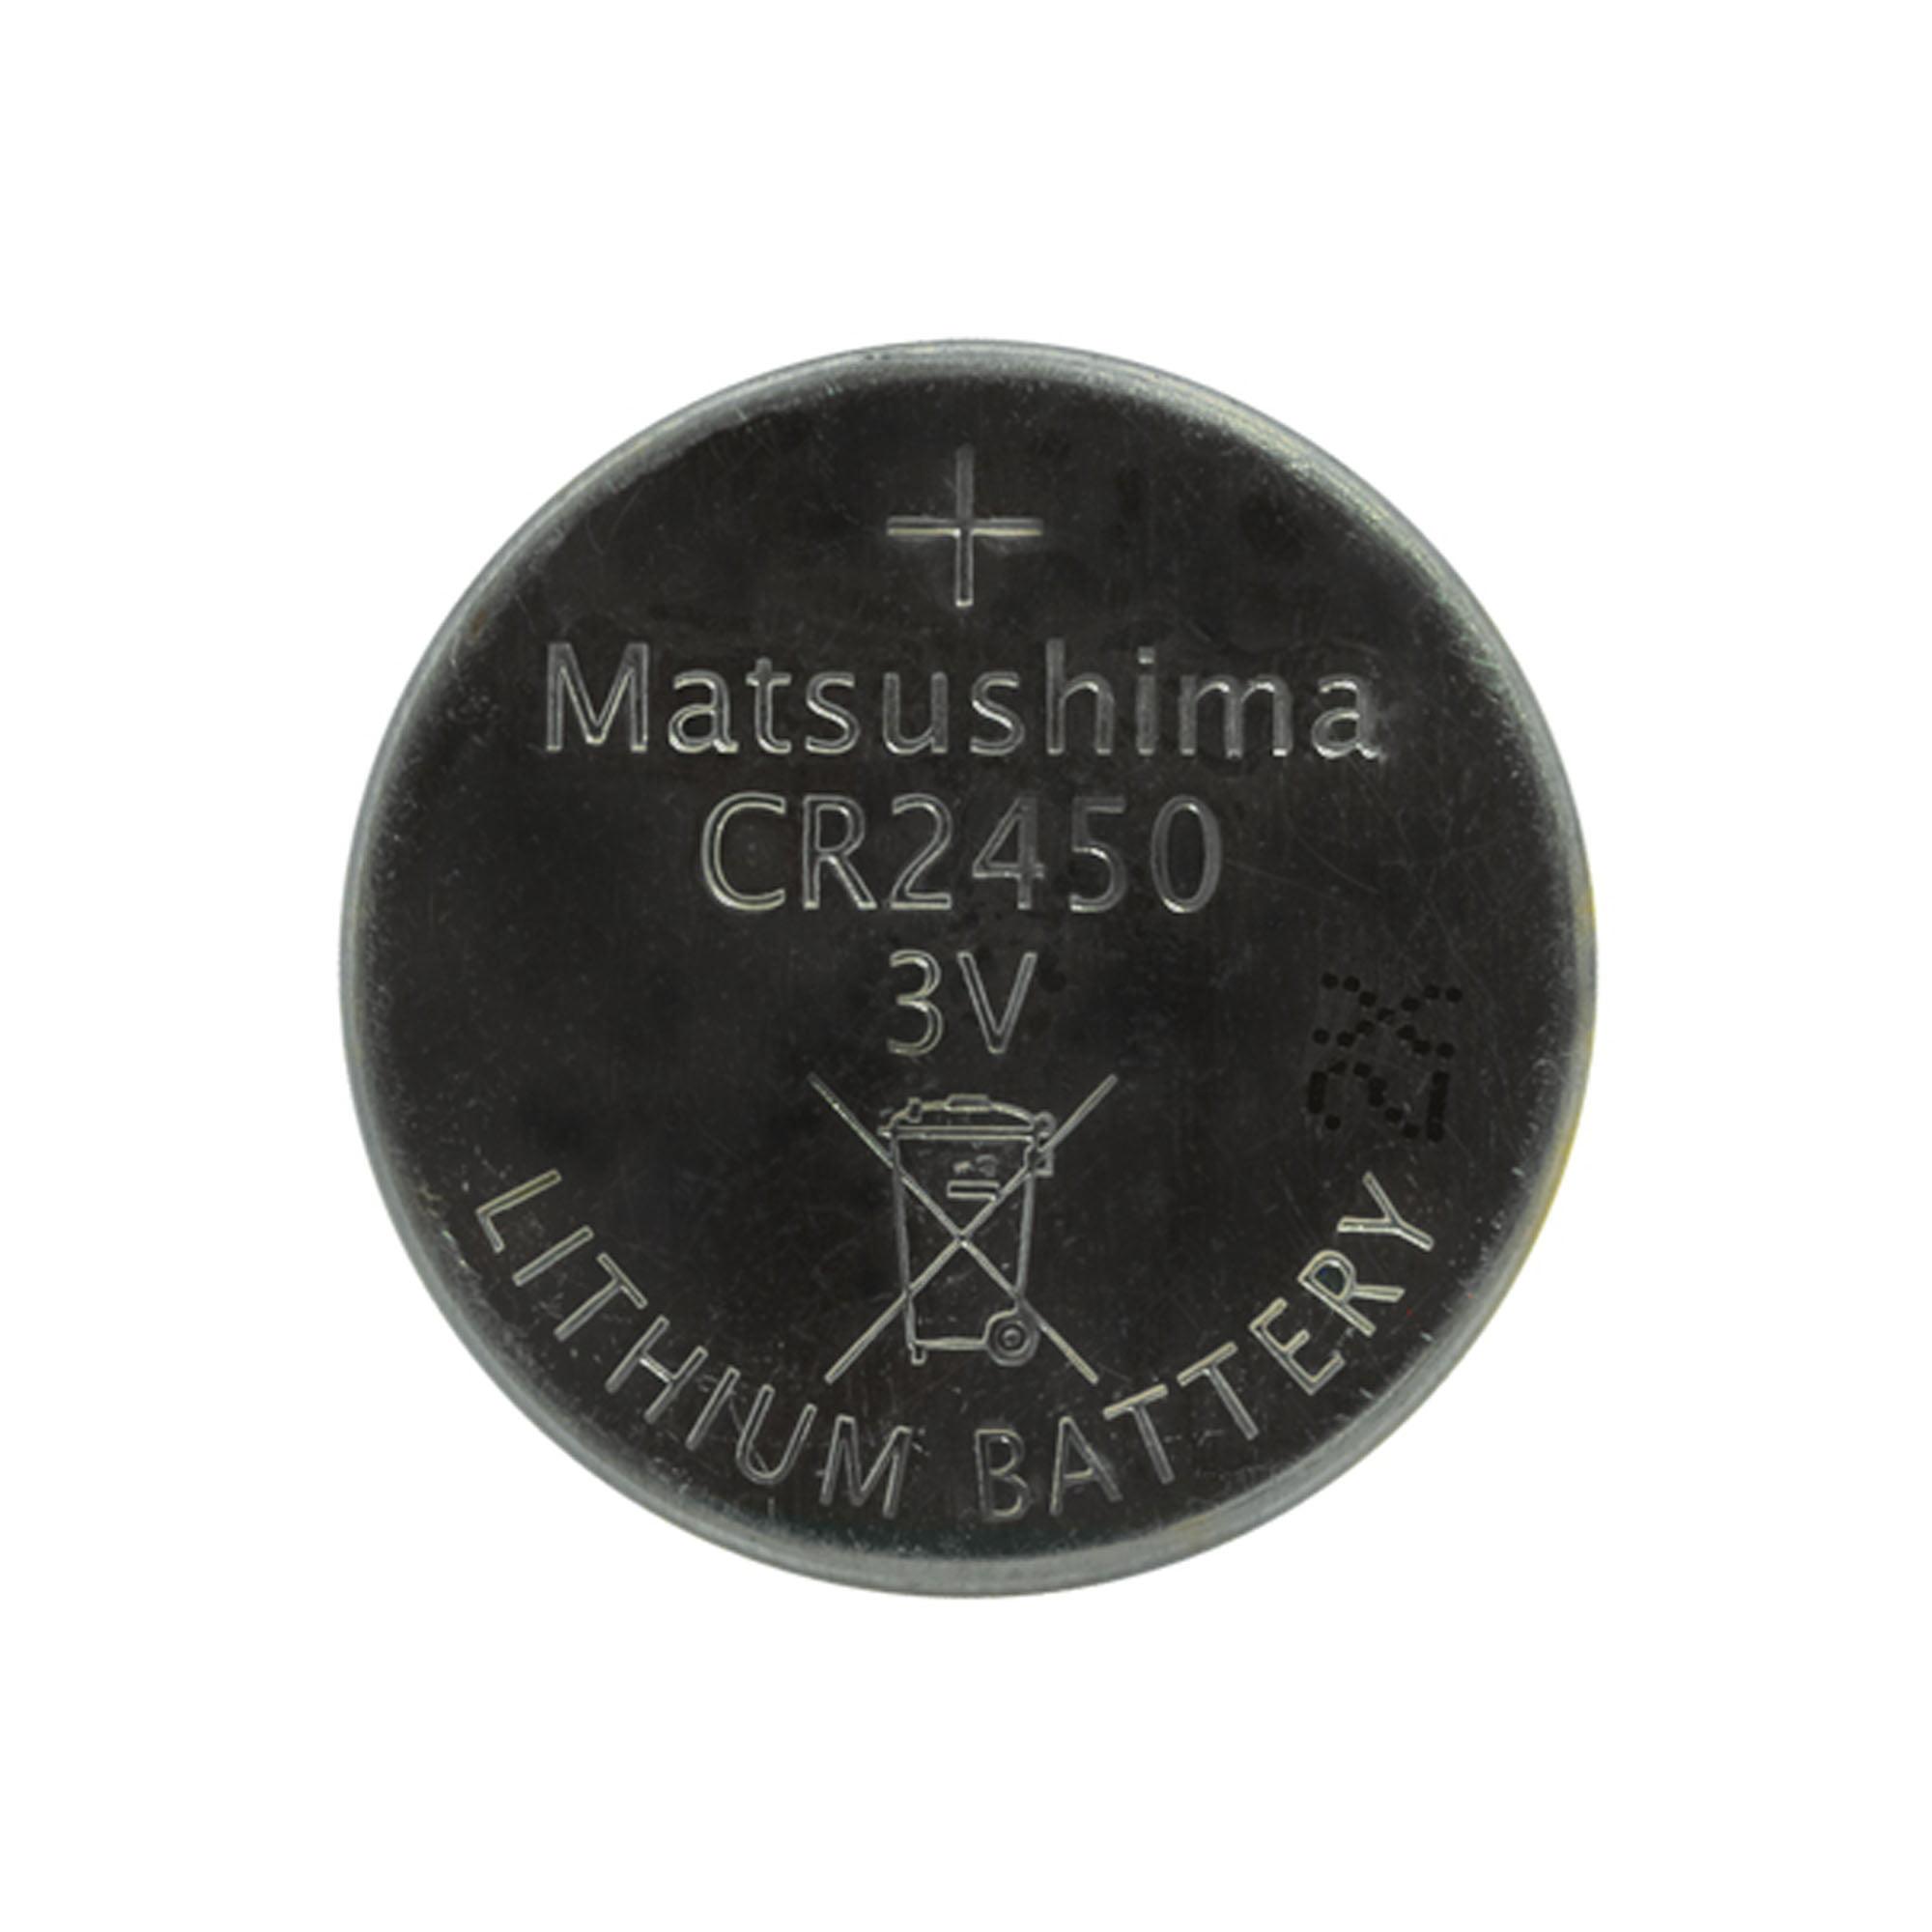 100-Pack CR2450N 3 Volt Lithium Coin Cell Batteries - image 1 de 1